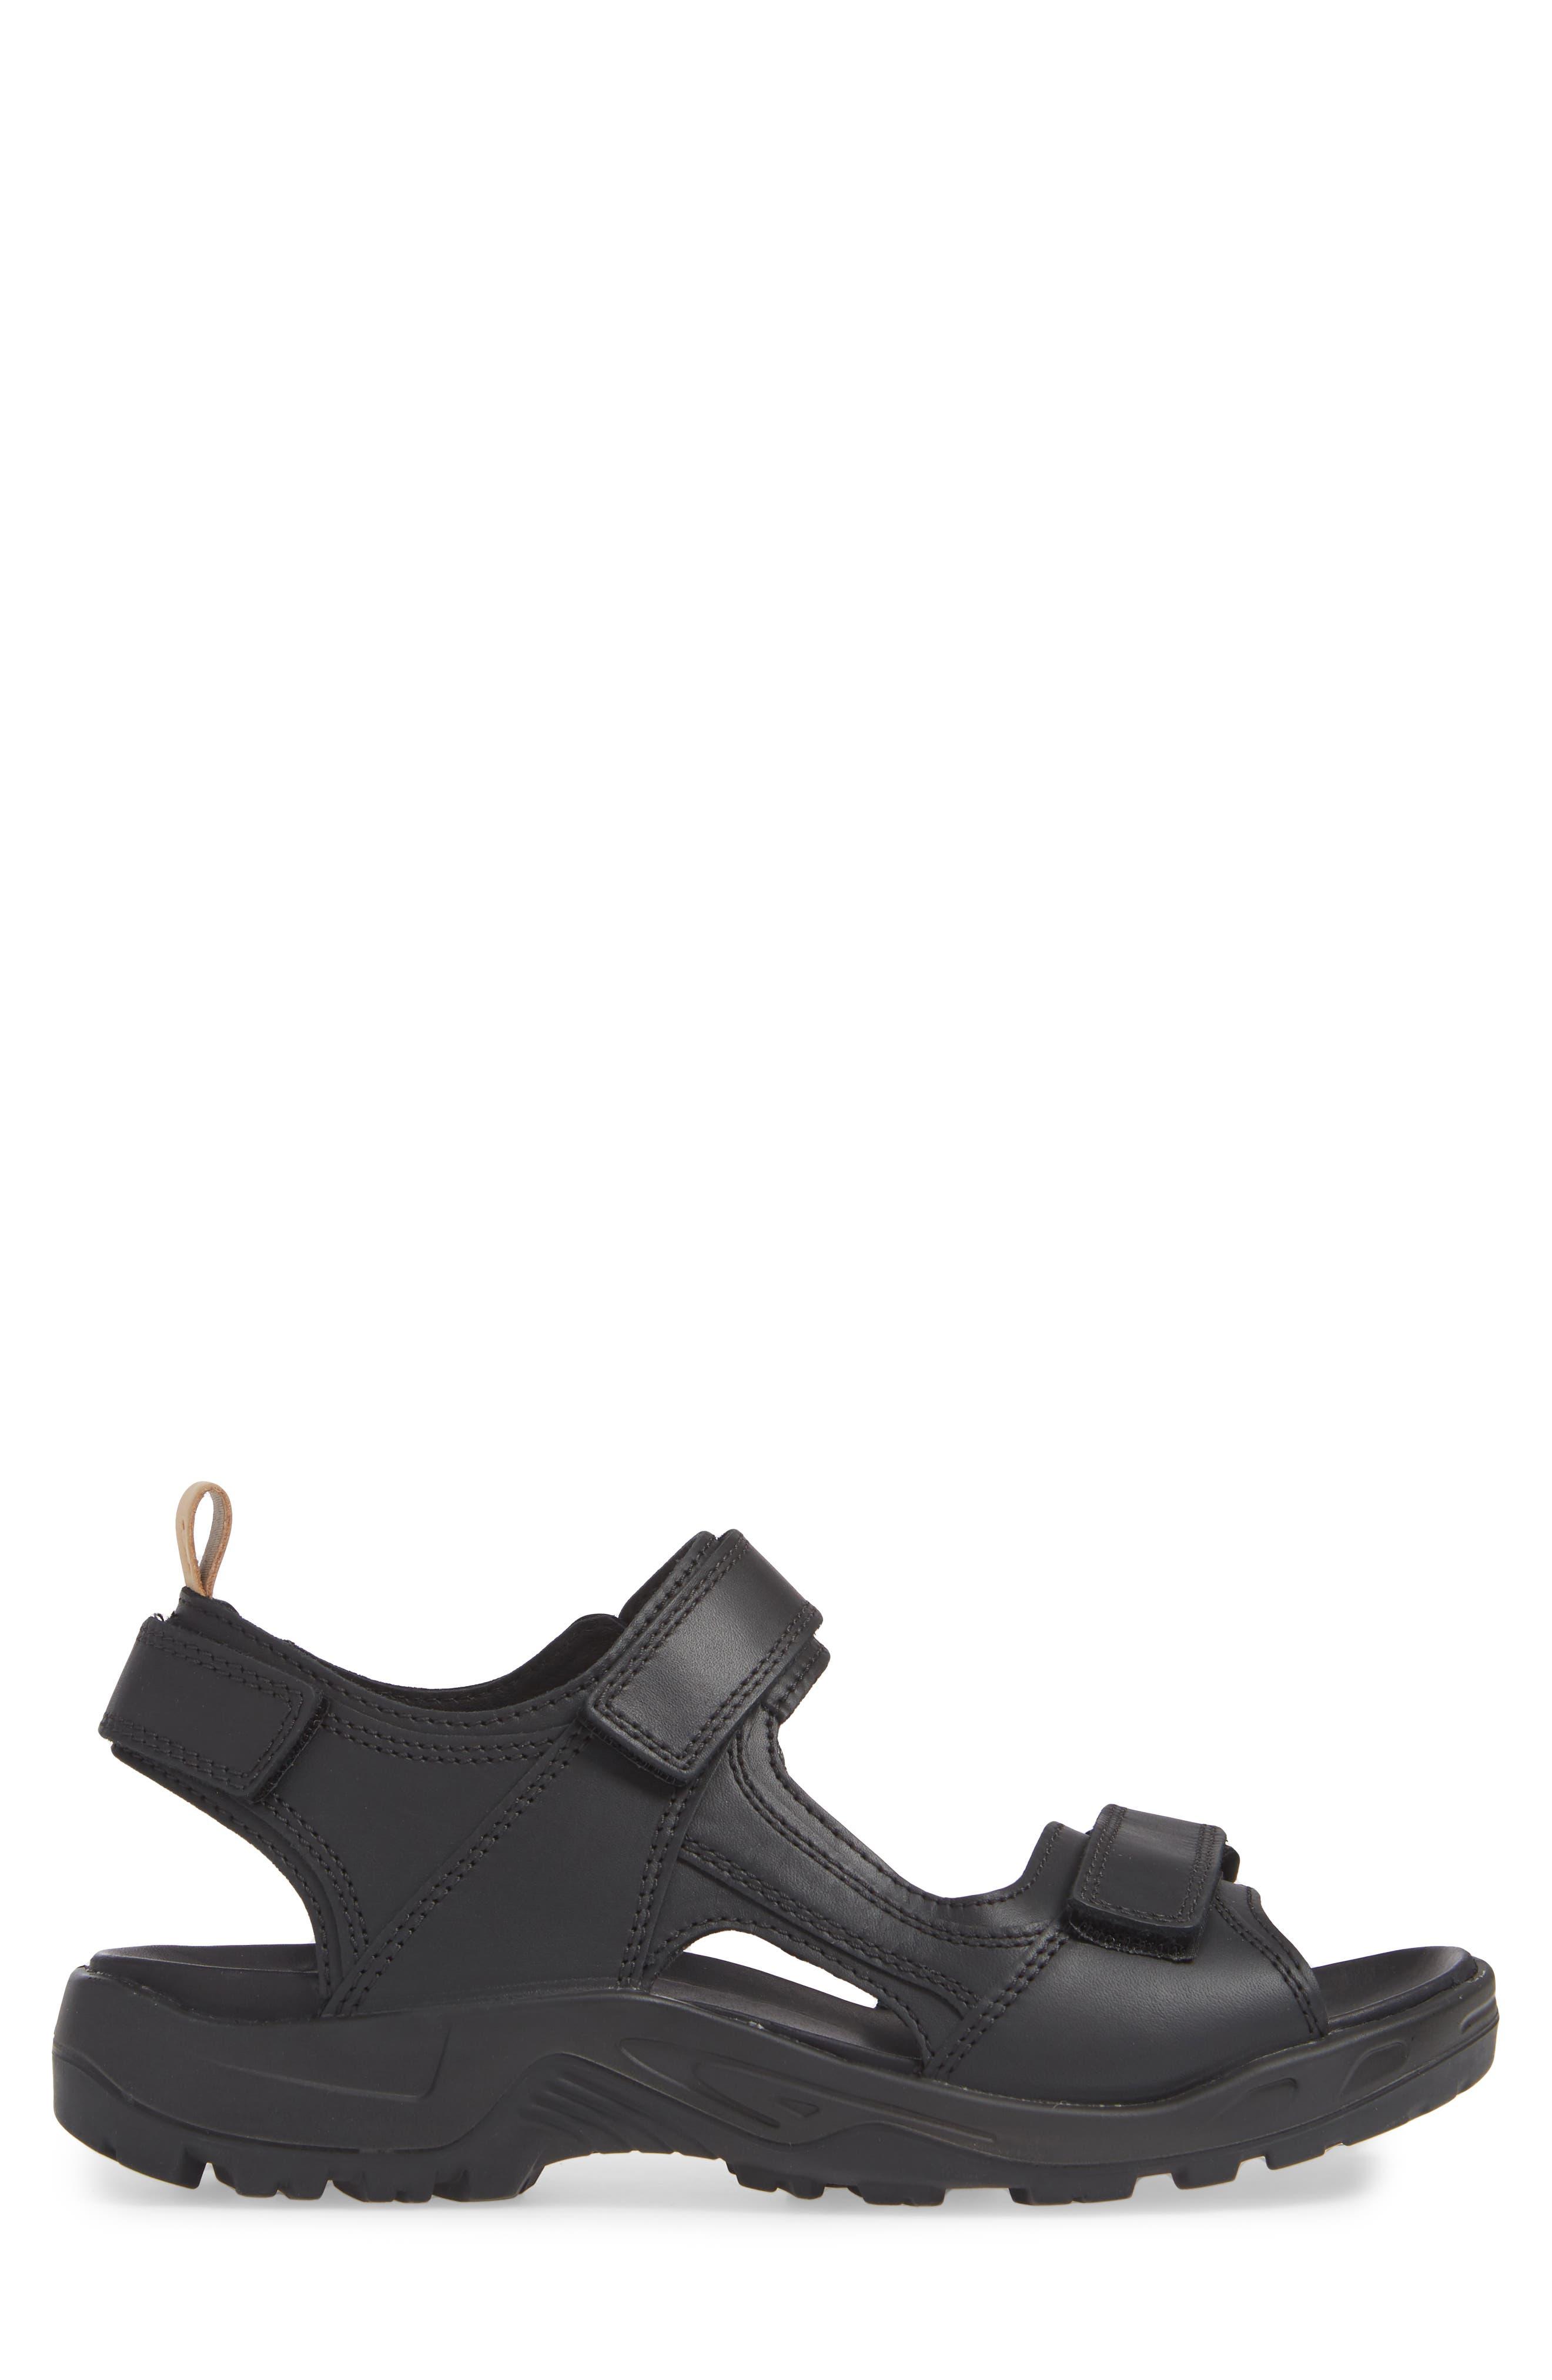 Premium Offroad Sandal,                             Alternate thumbnail 3, color,                             BLACK LEATHER